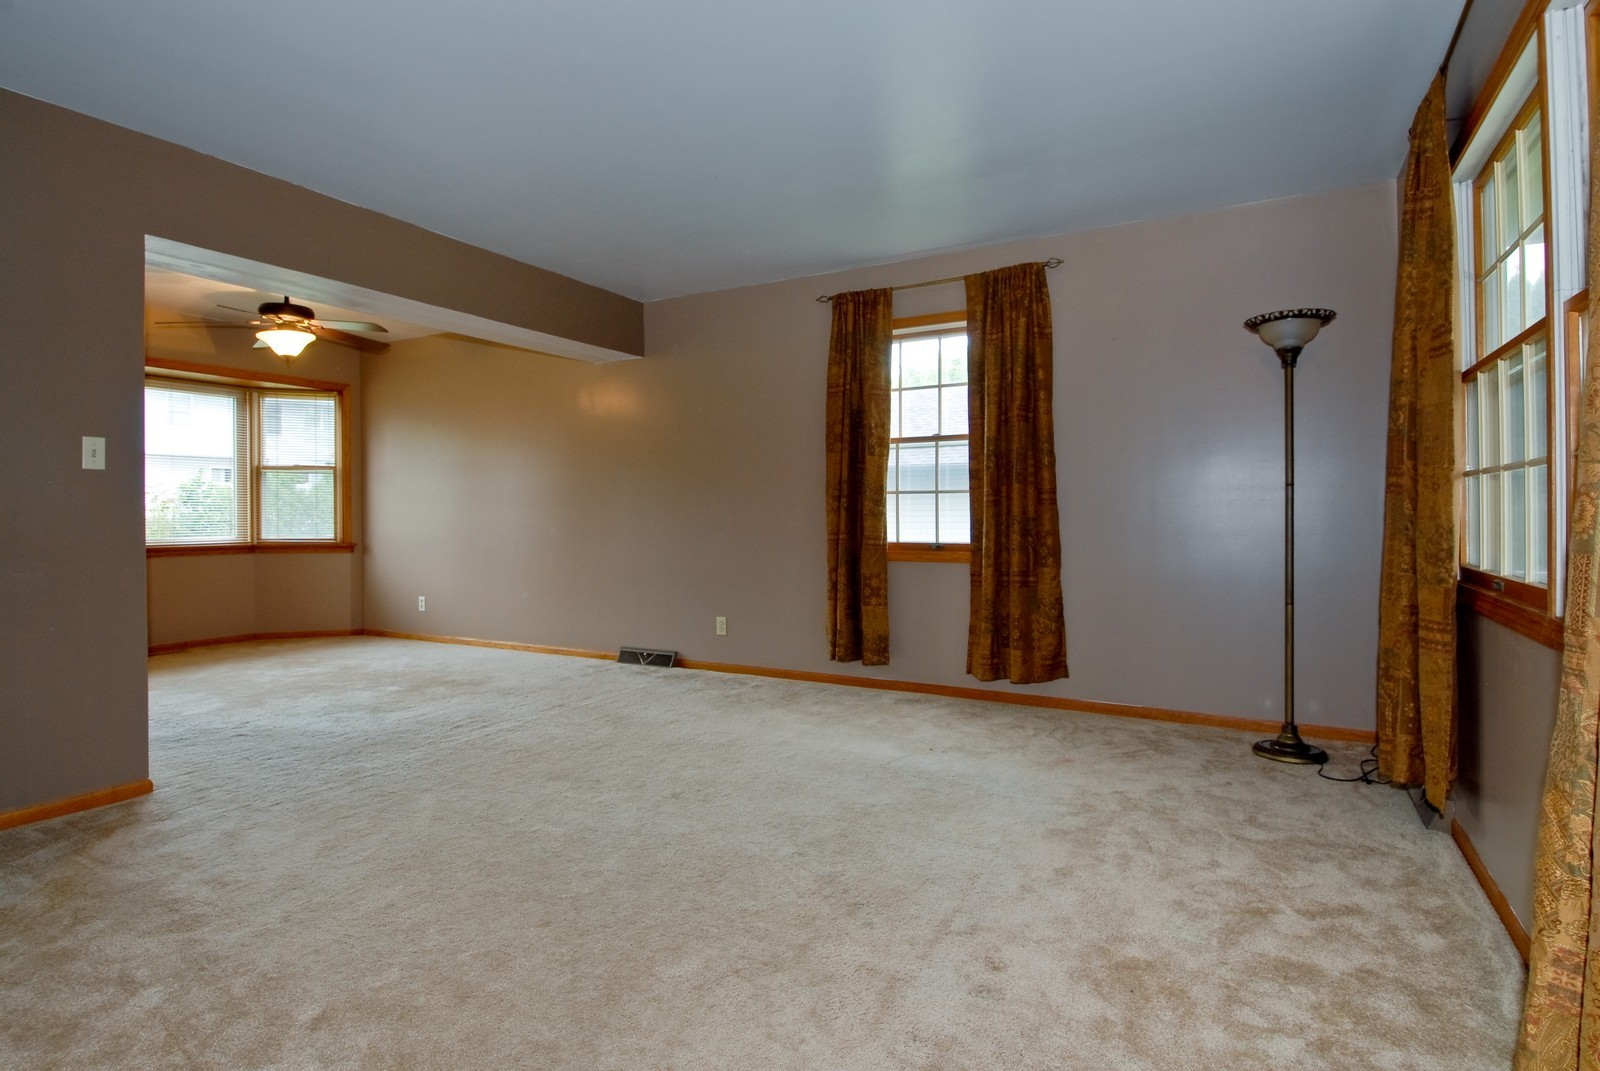 Real Estate Photography - 210 Pardridge Pl, Dekalb, IL, 60115 - Living Room